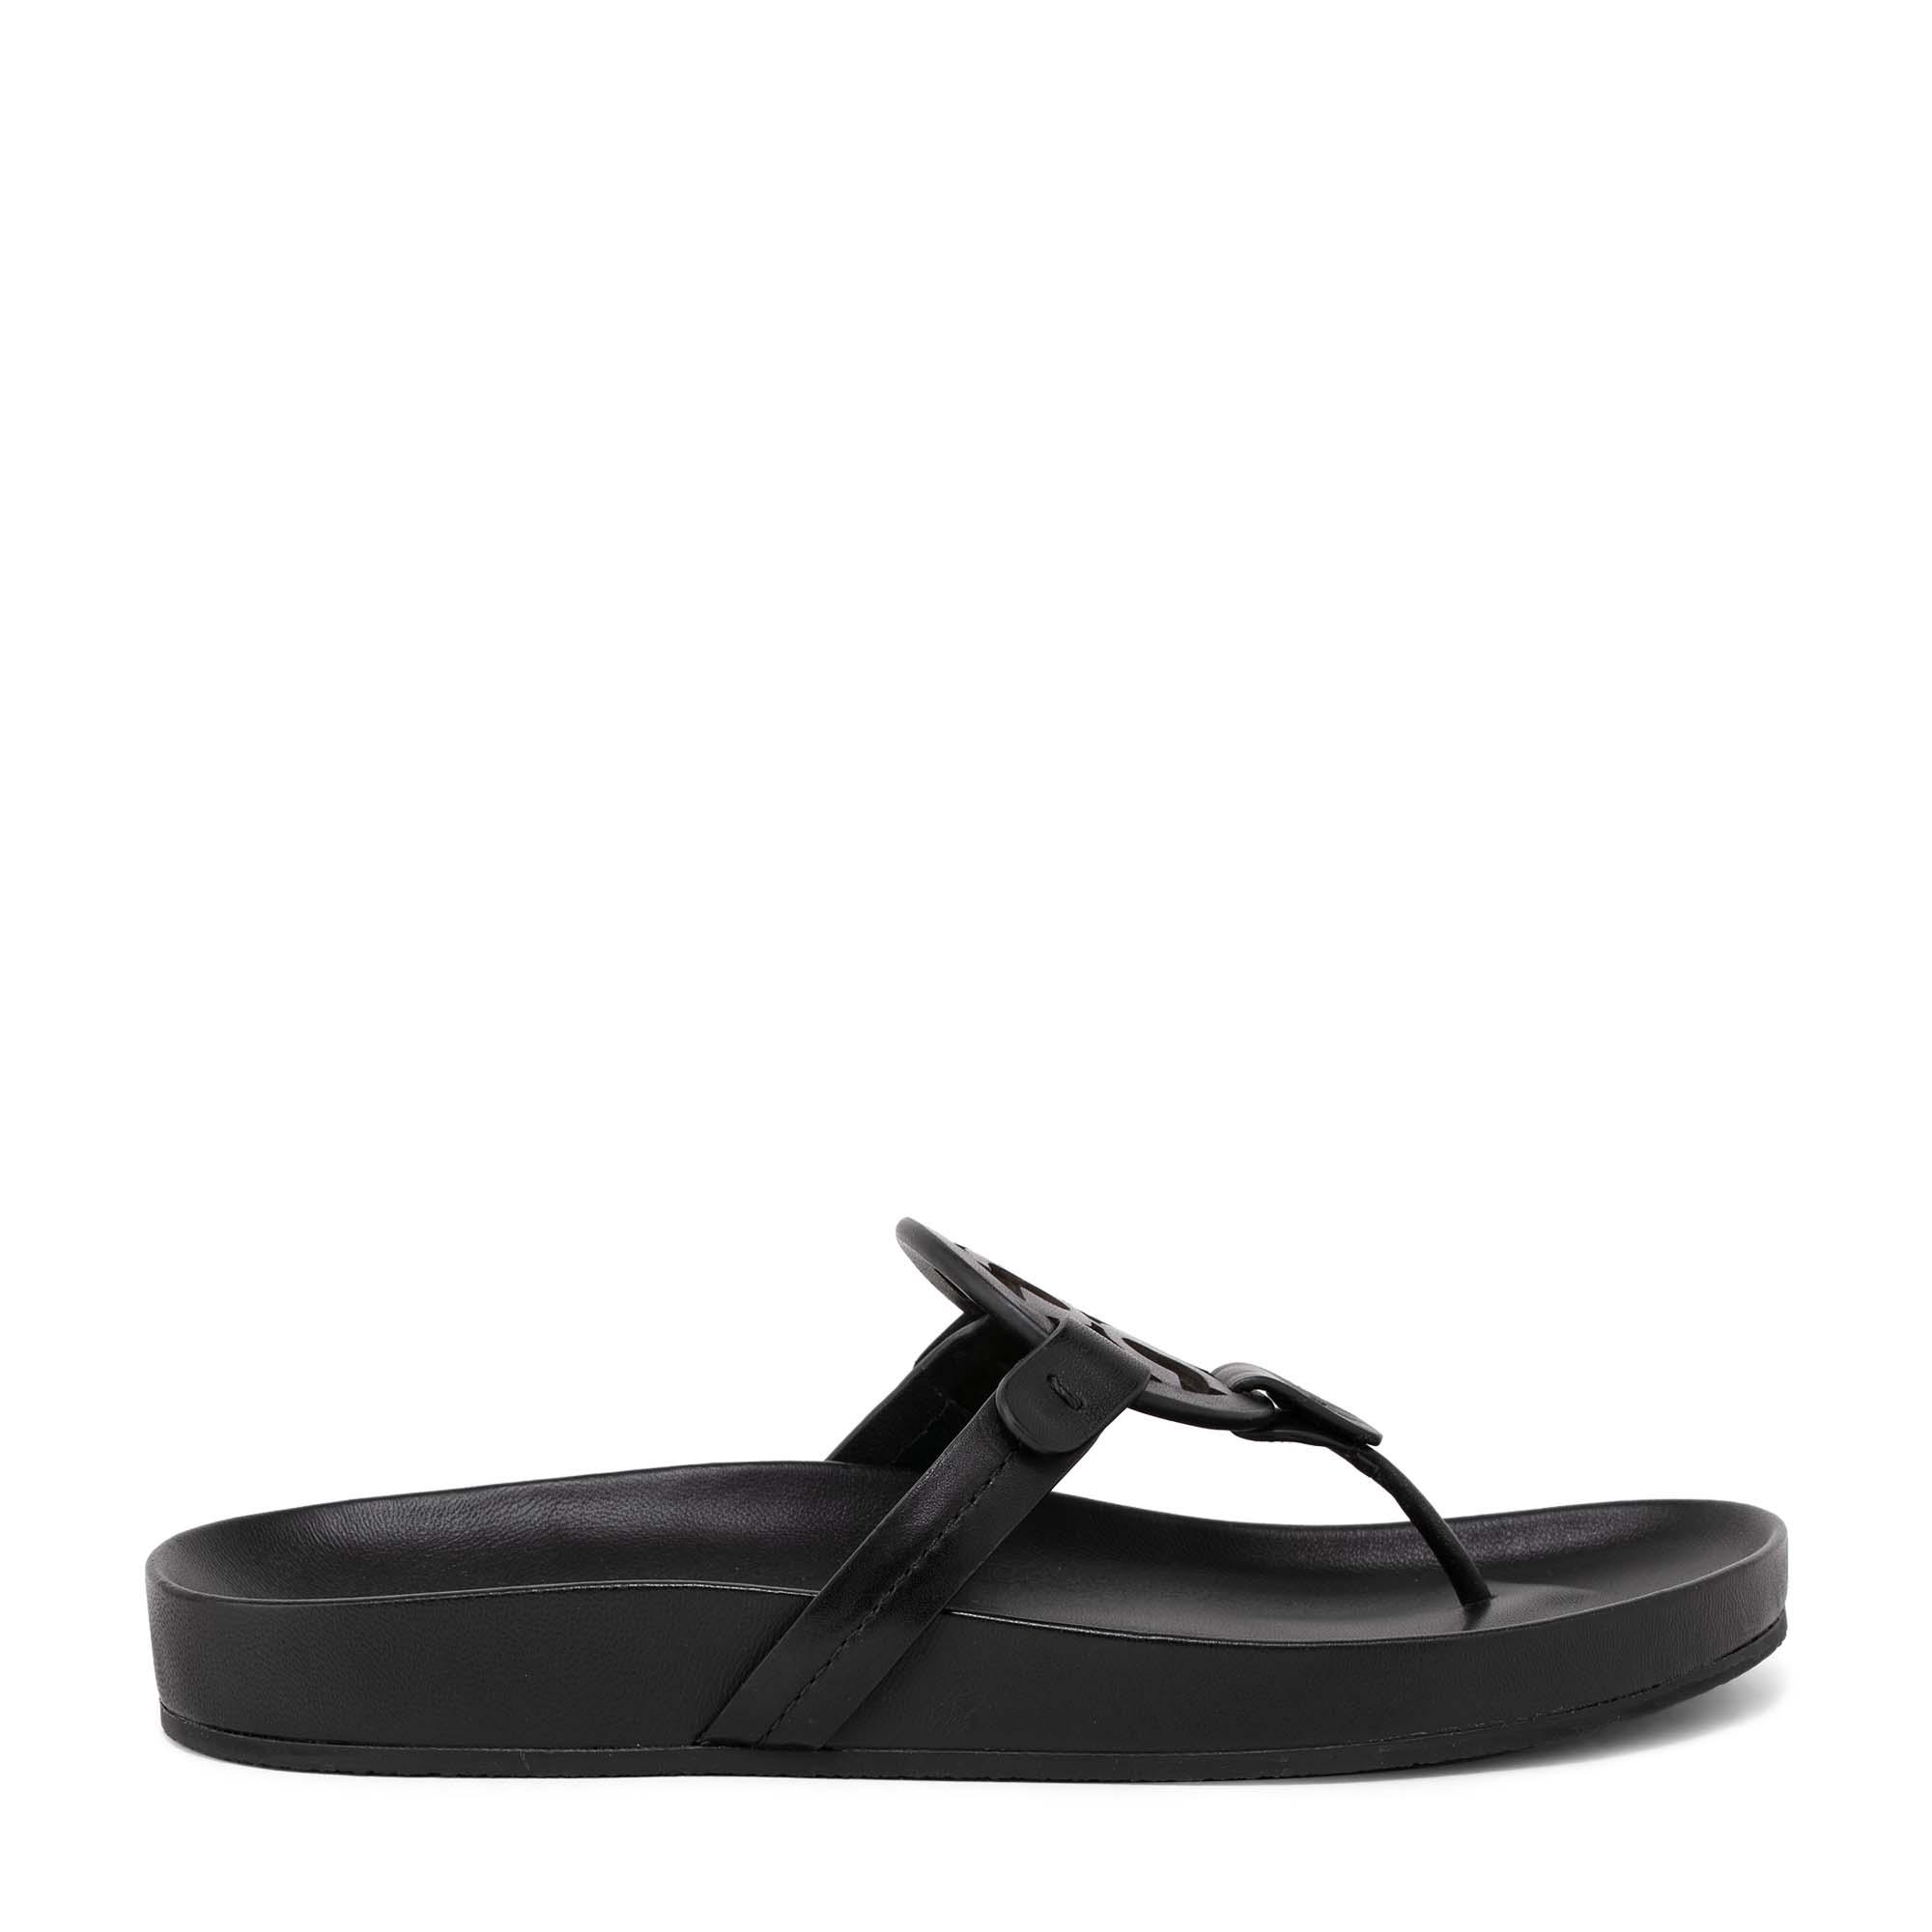 Miller Cloud sandals